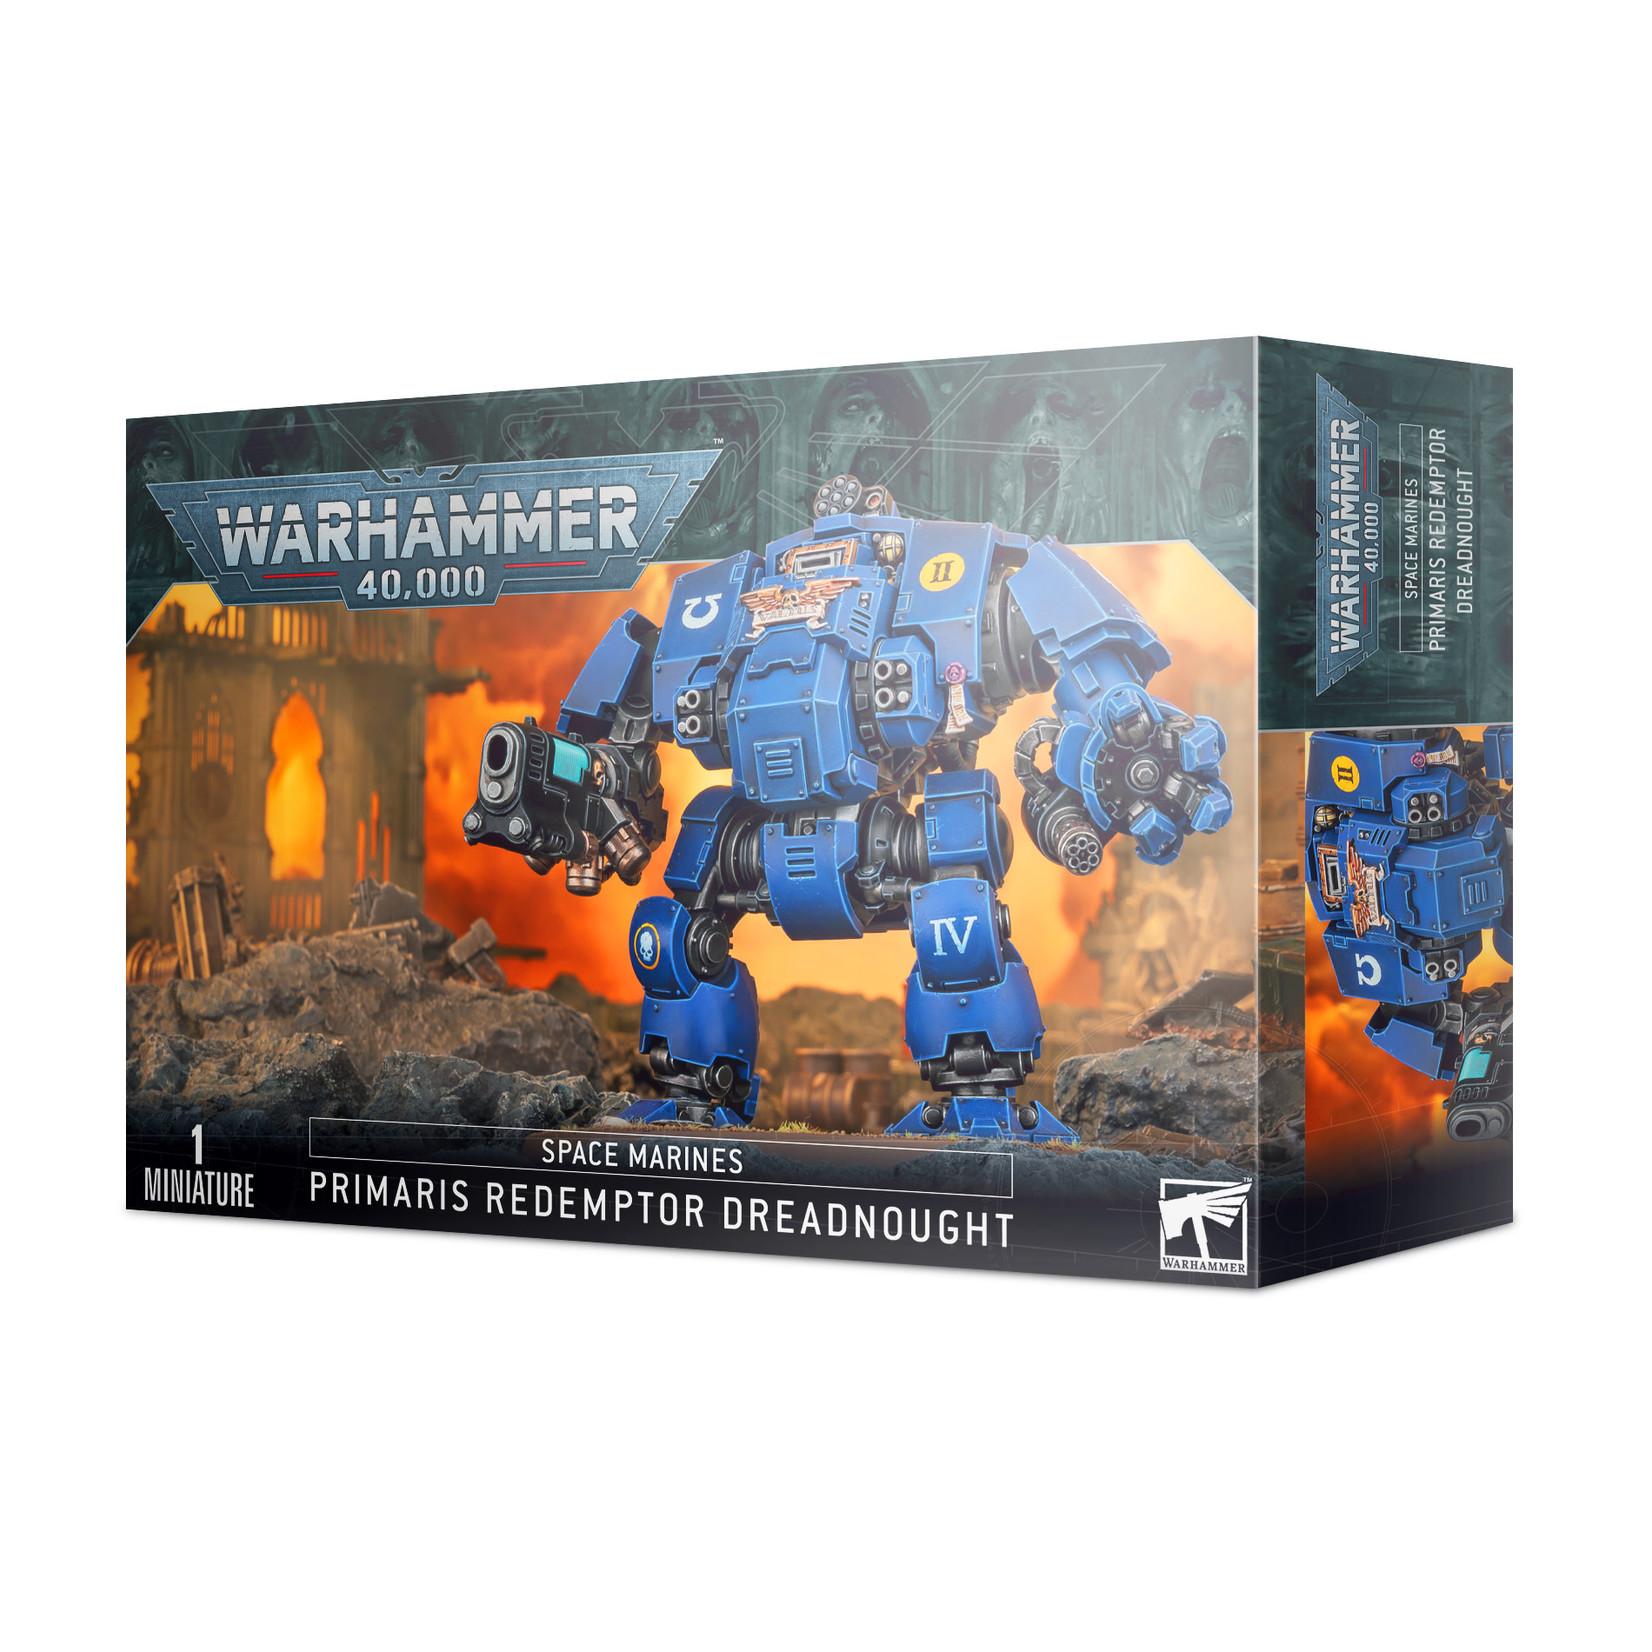 Games Workshop Warhammer 40k: Space Marines - Primaris Redemptor Dreadnought